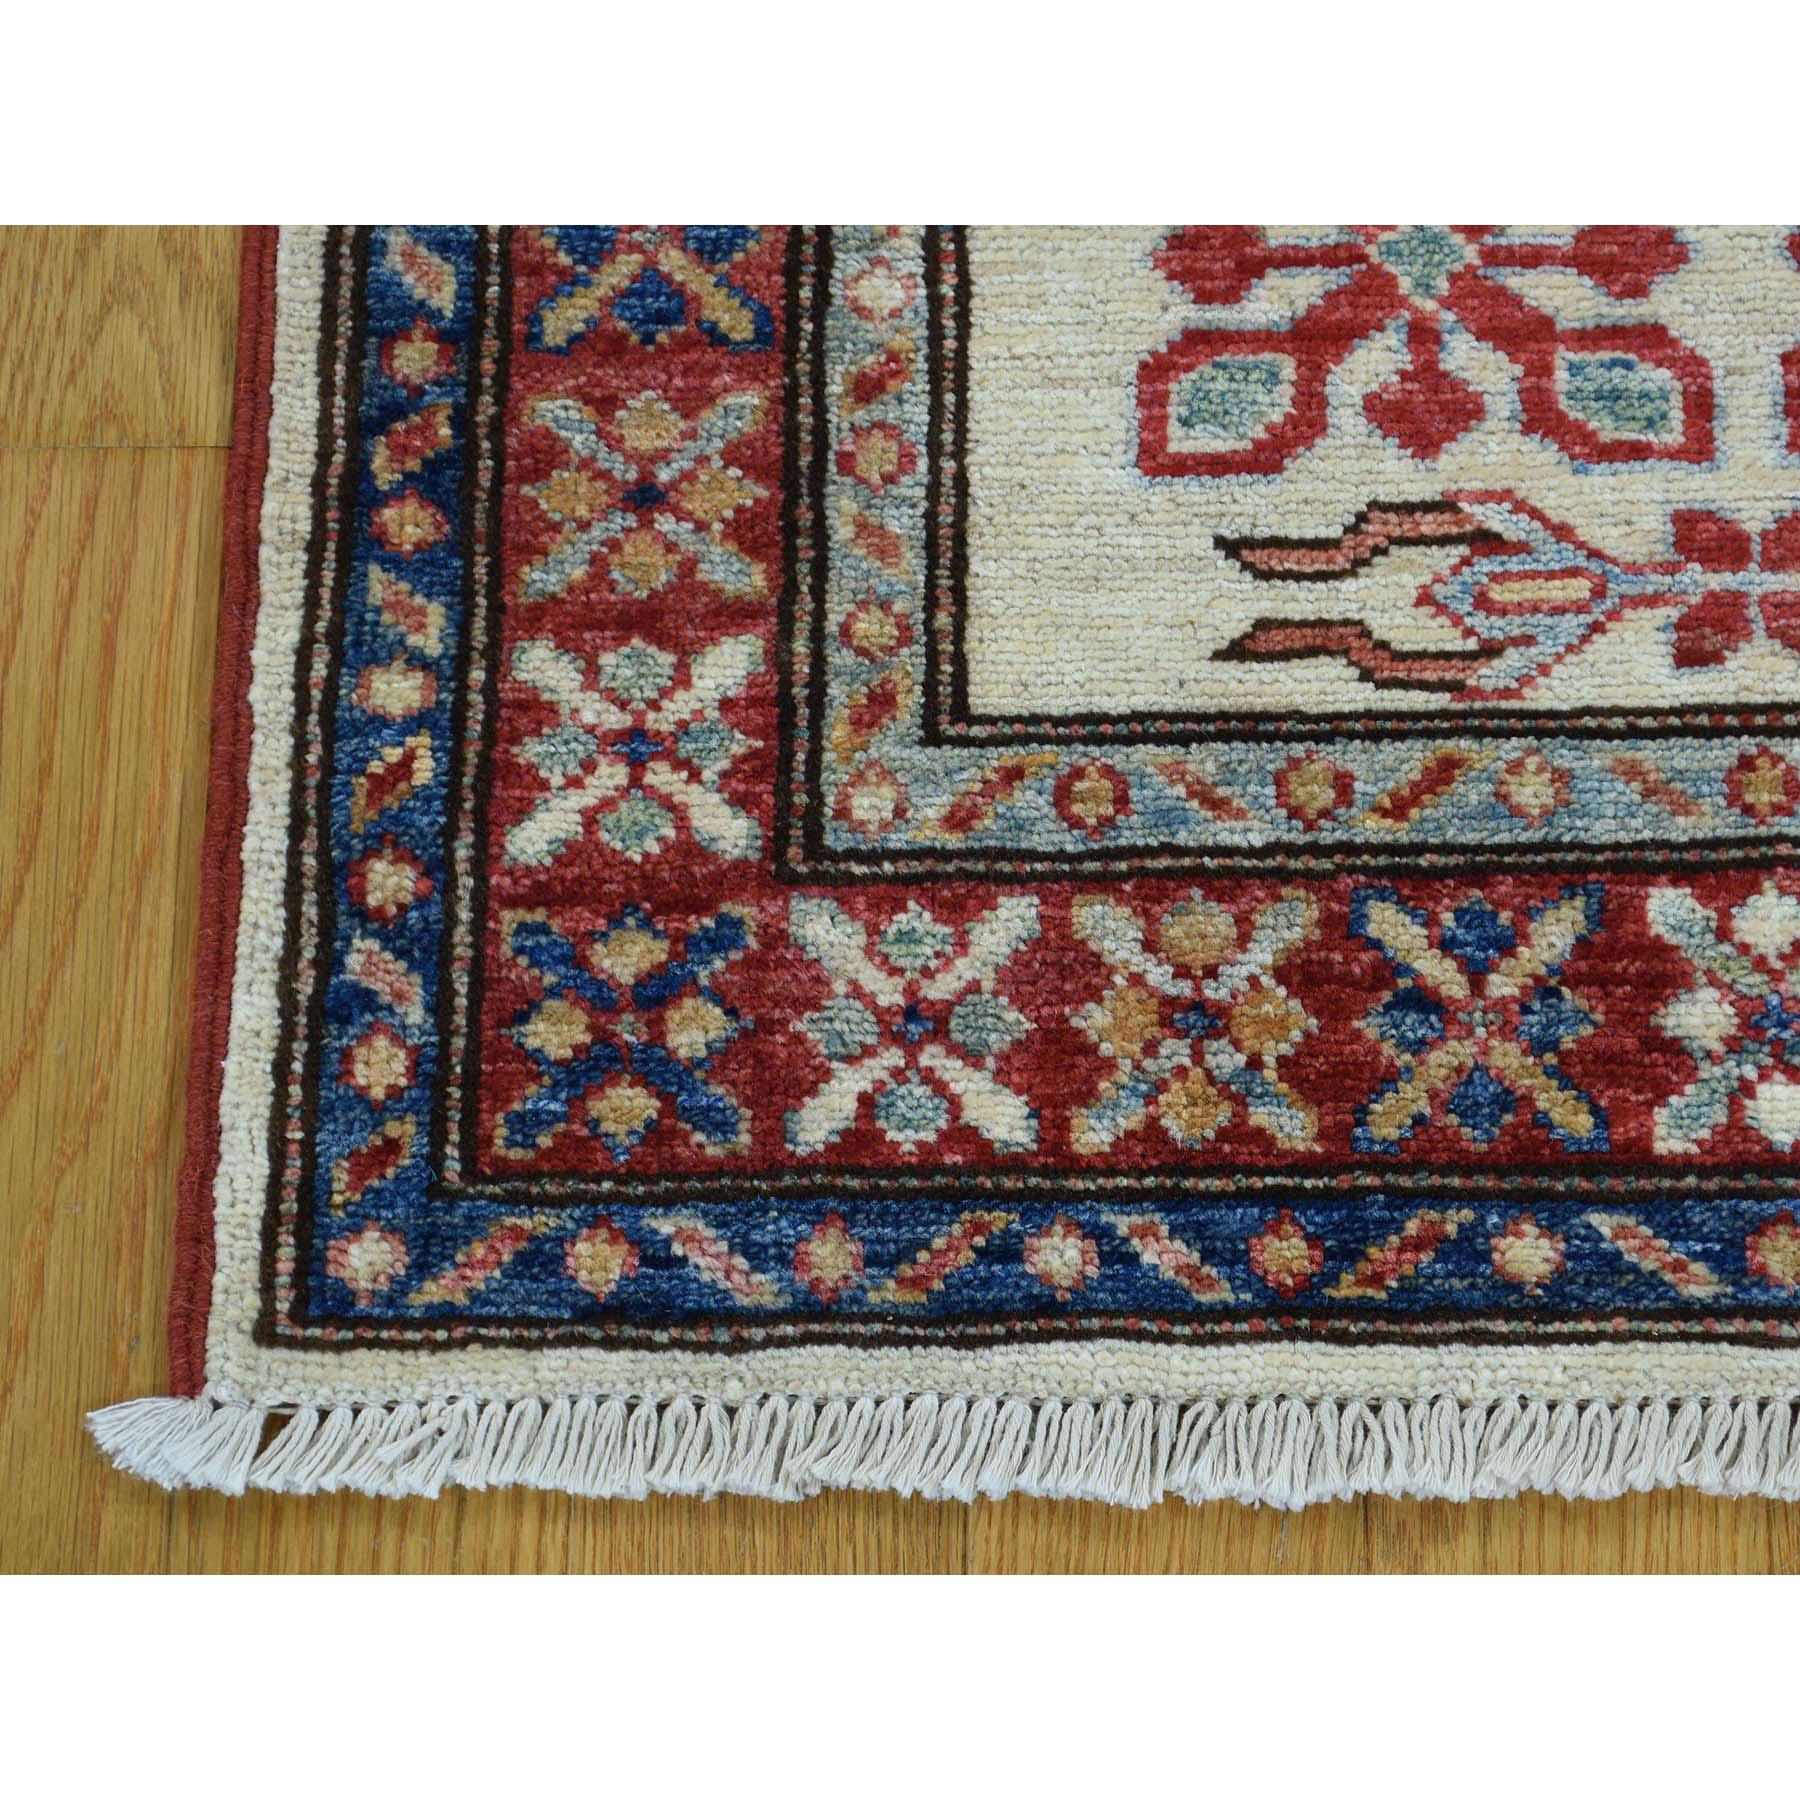 2-1 X2-10  Hand Knotted Tribal And Geometric Pure Wool Super Kazak Rug